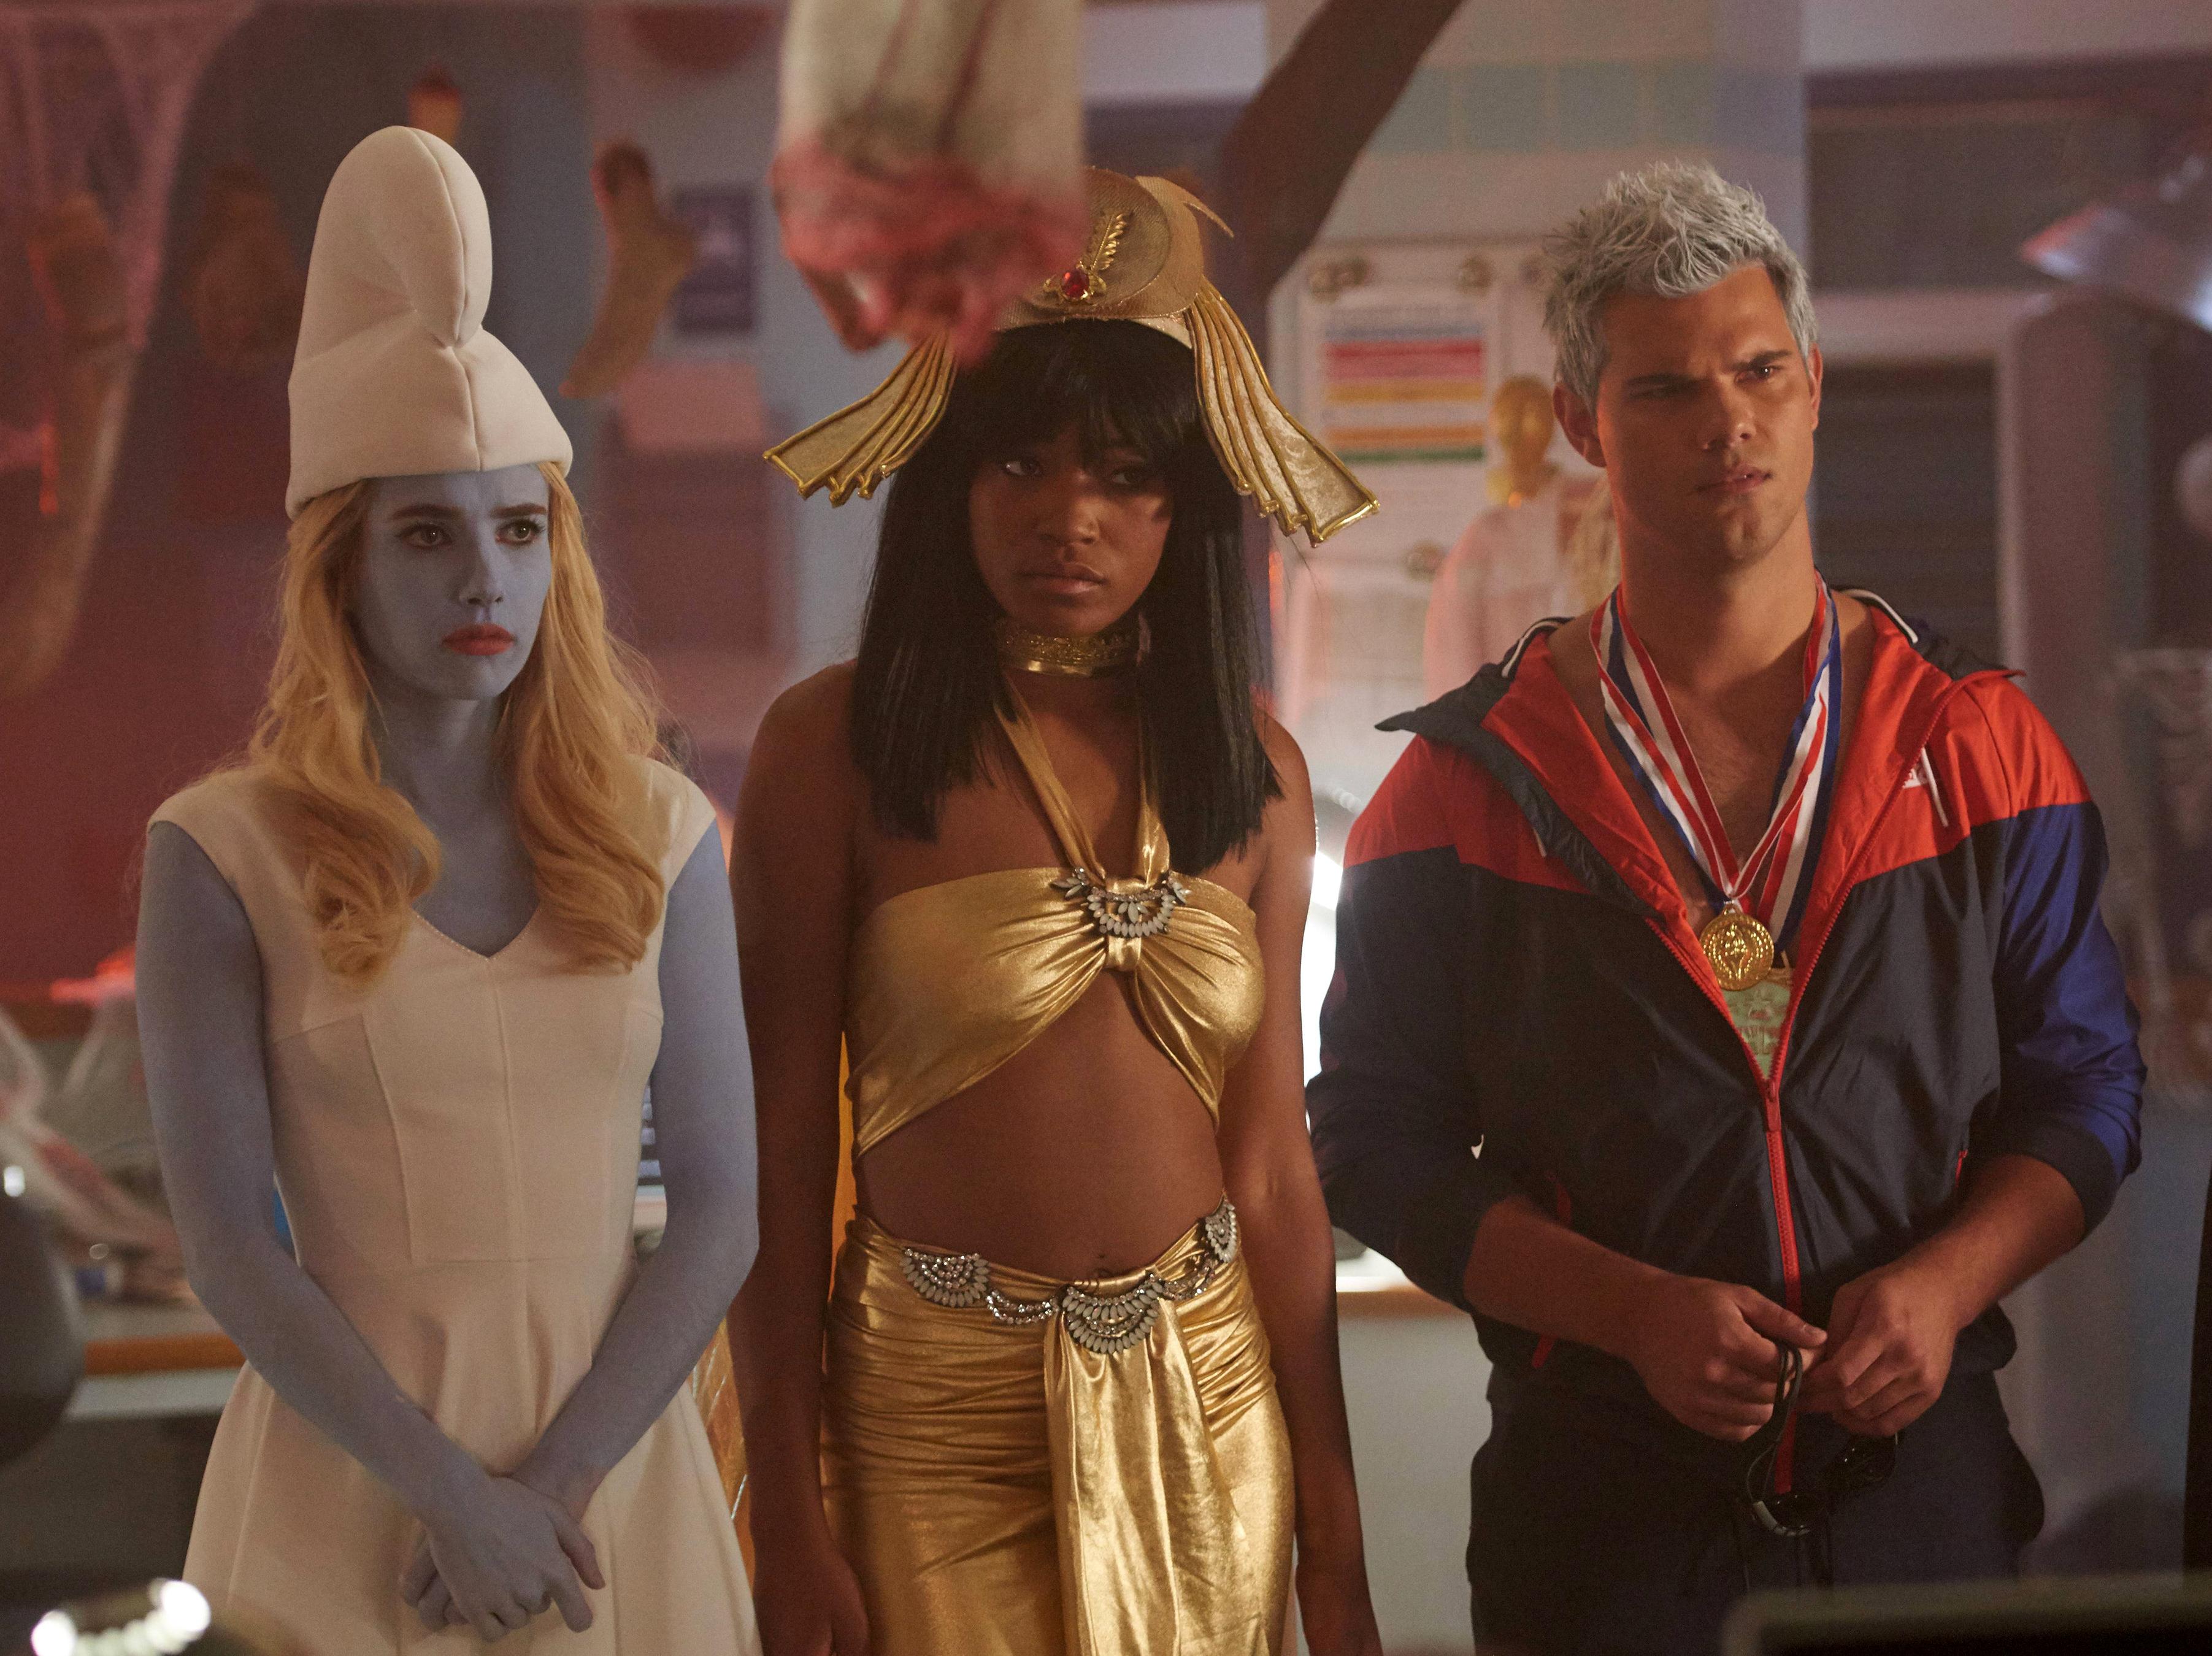 Emma Roberts, Keke Palmer and Taylor Lautner in Scream Queens.